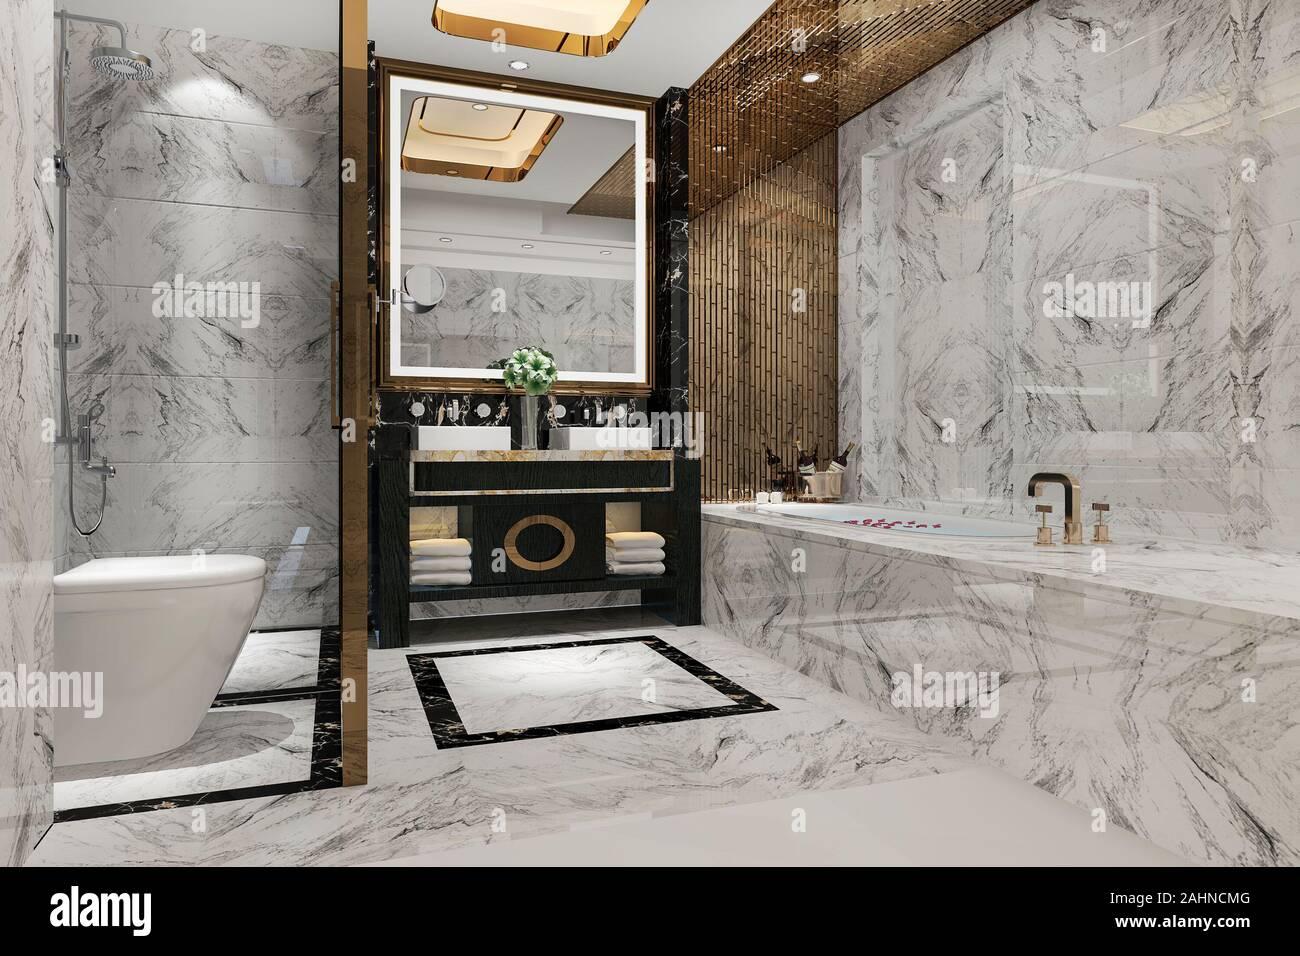 3d Rendering Luxury Modern Design Bathroom And Toilet Stock Photo Alamy